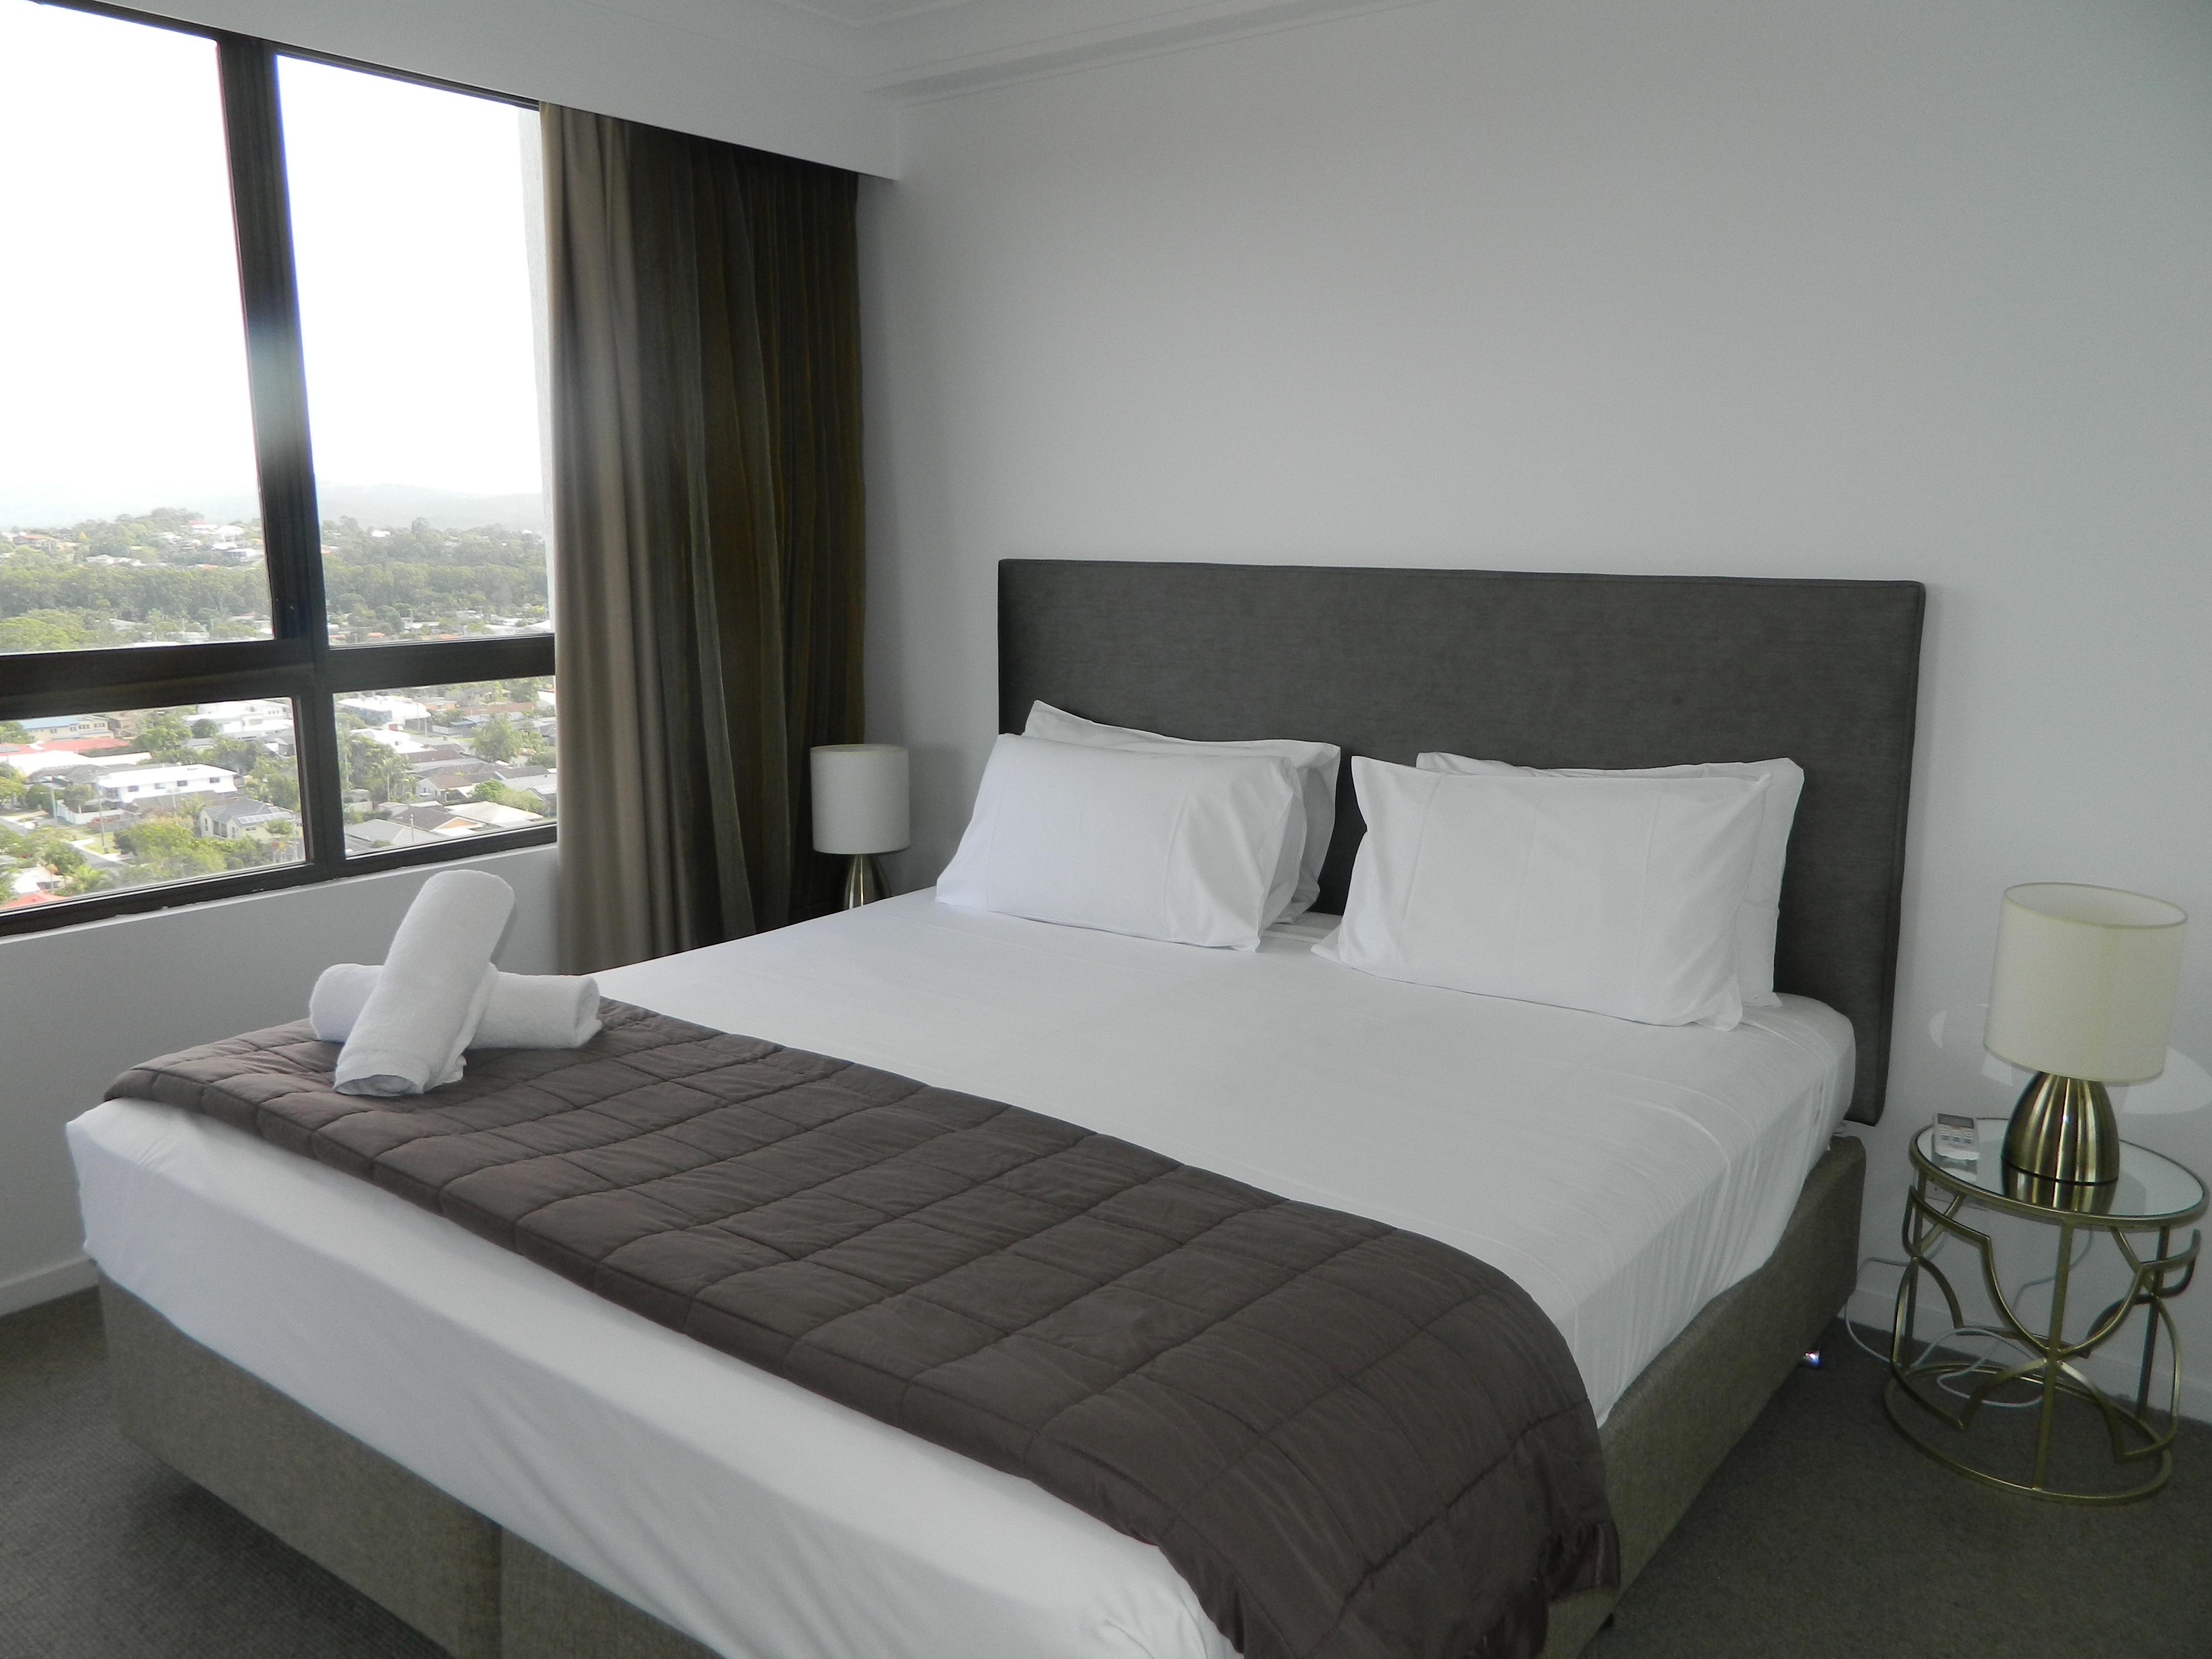 Royal Palm Resort Accommodation Bedroom